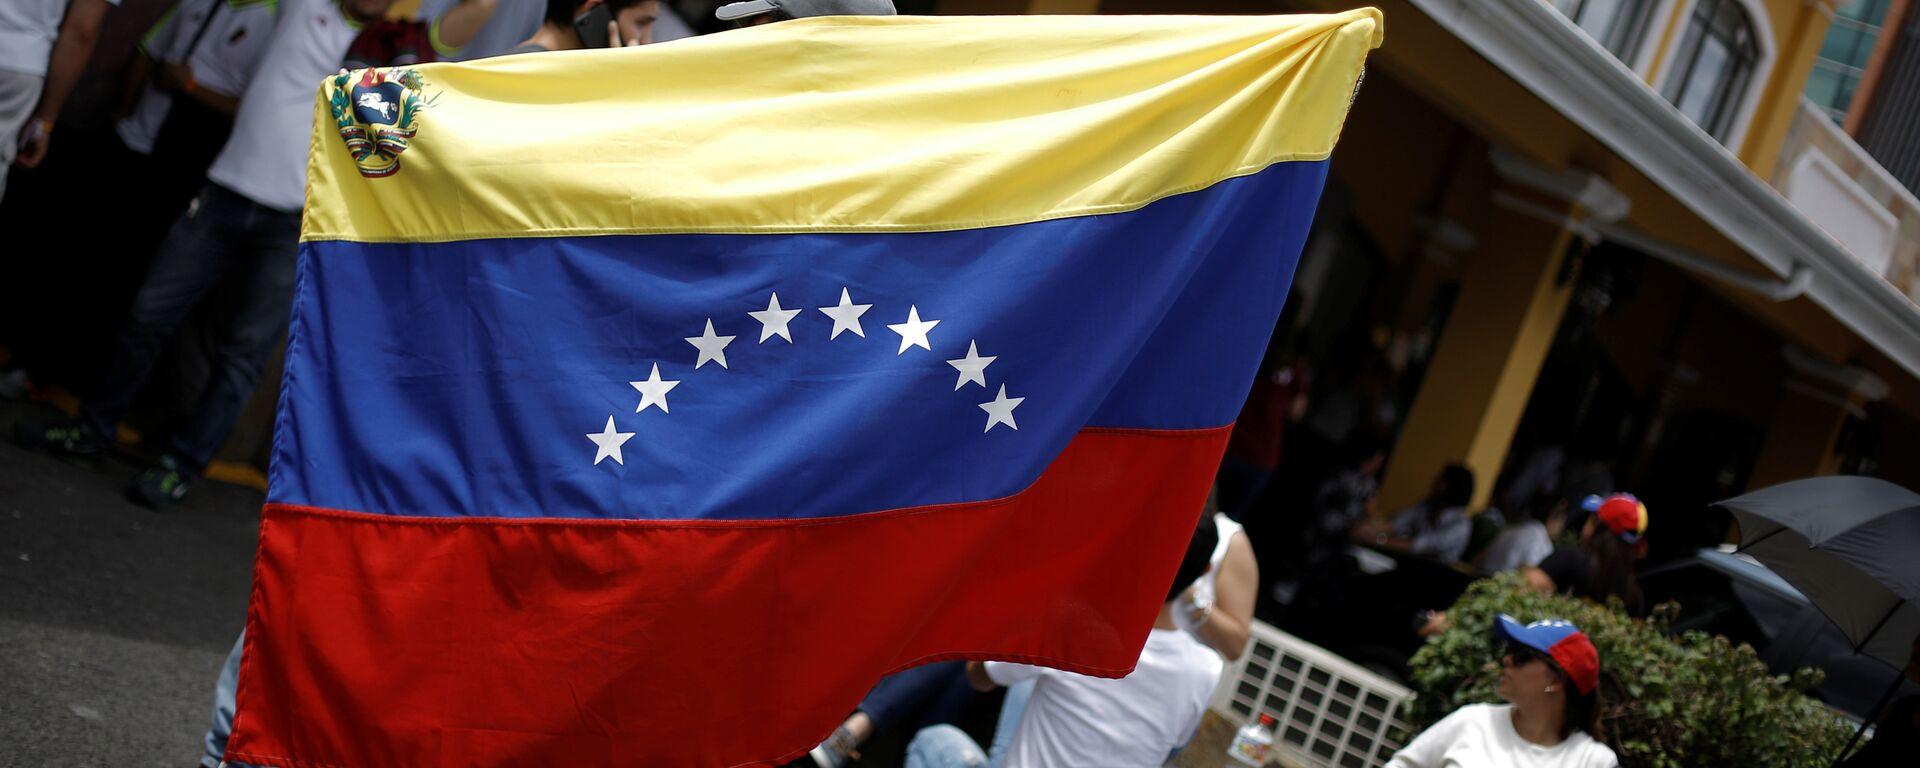 Bandera de Venezuela (imagen referencial) - Sputnik Mundo, 1920, 23.08.2021